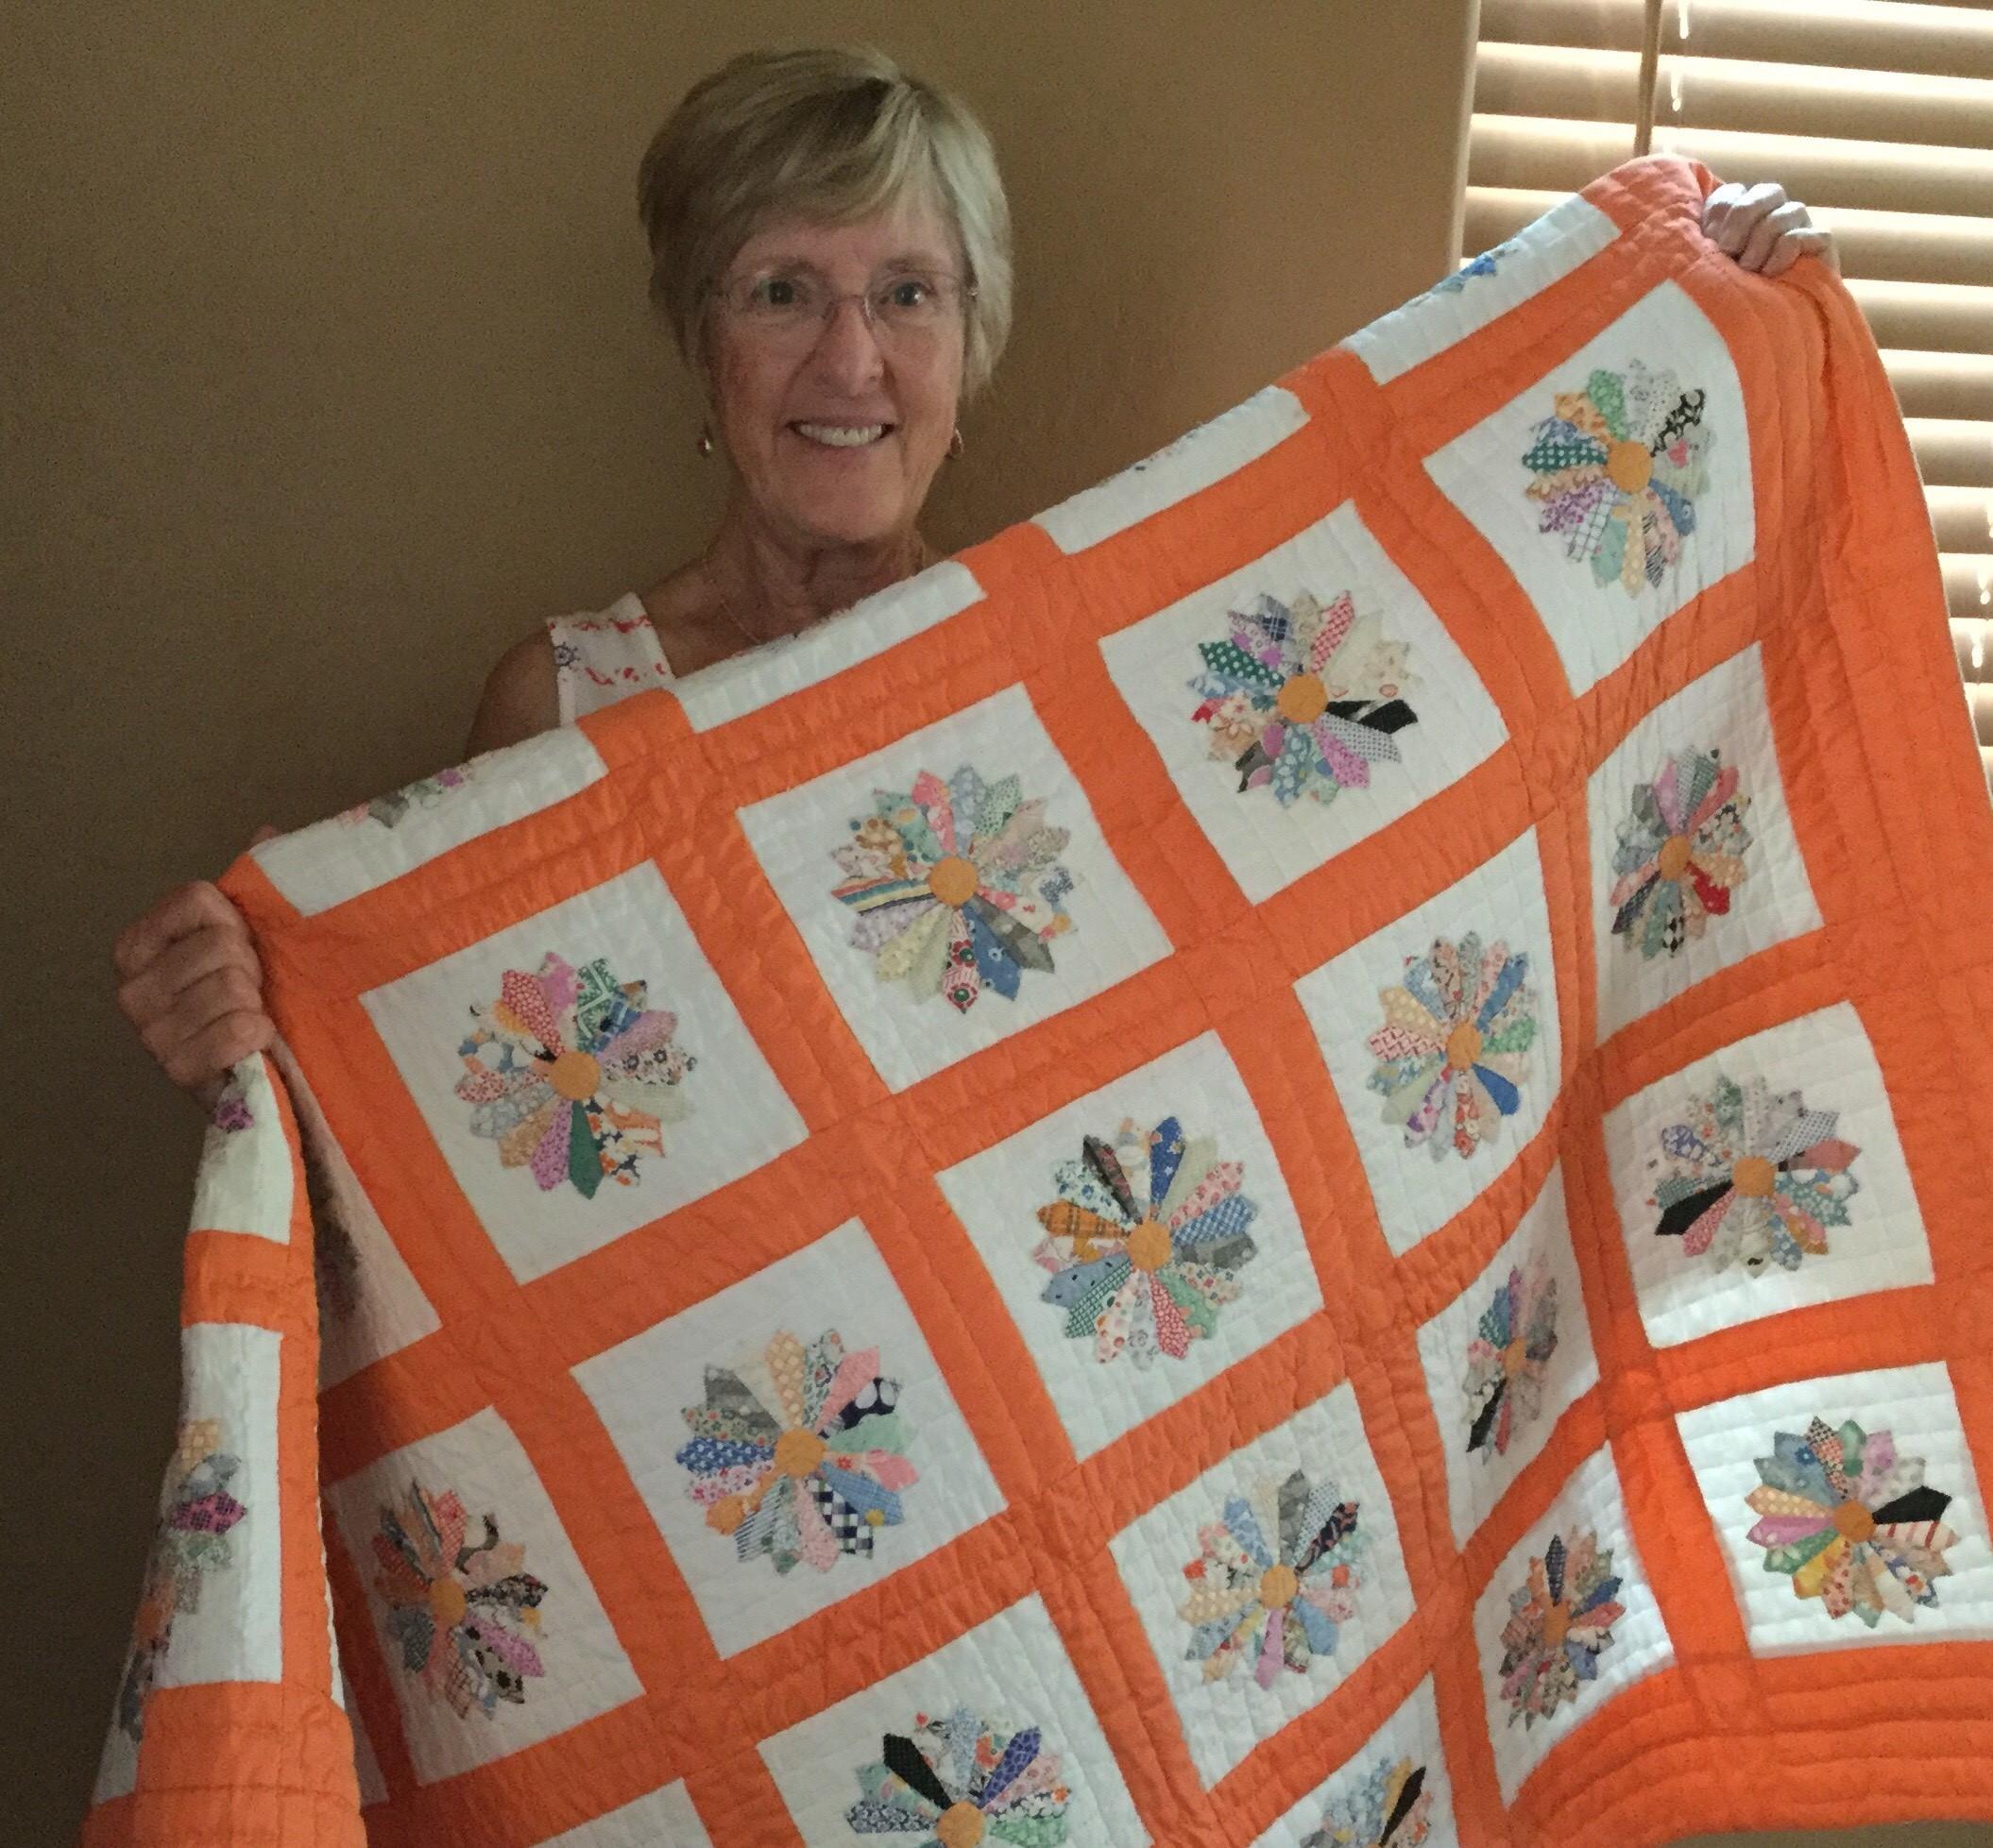 2019 raffle quilt winner Sue Burdette from LaHacienda